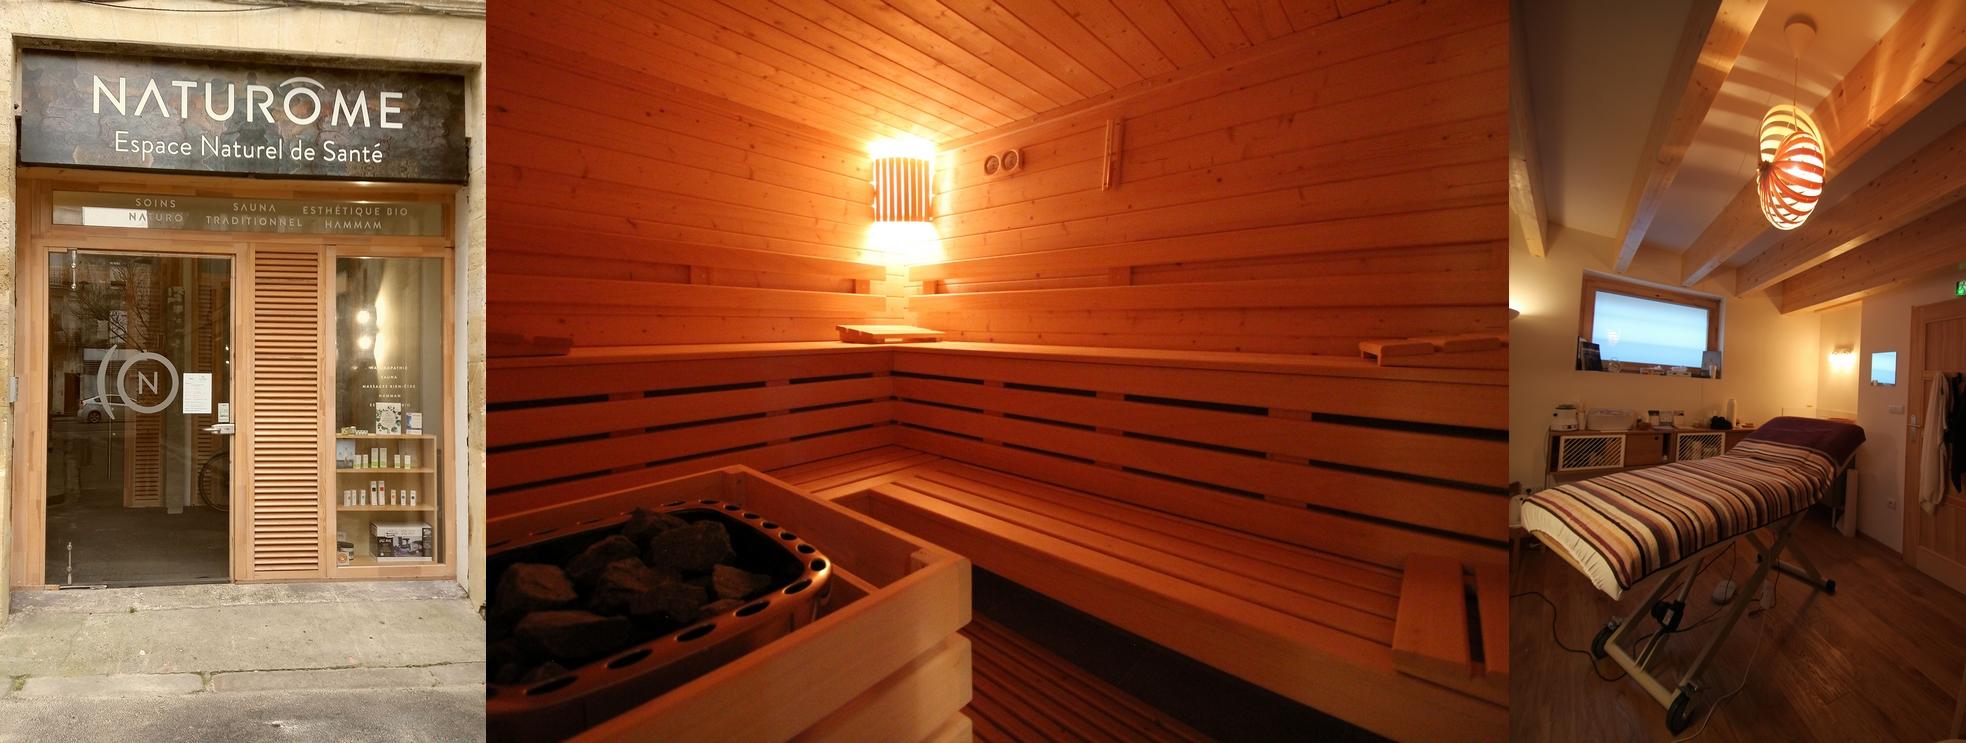 Naturôme sauna Bordeaux